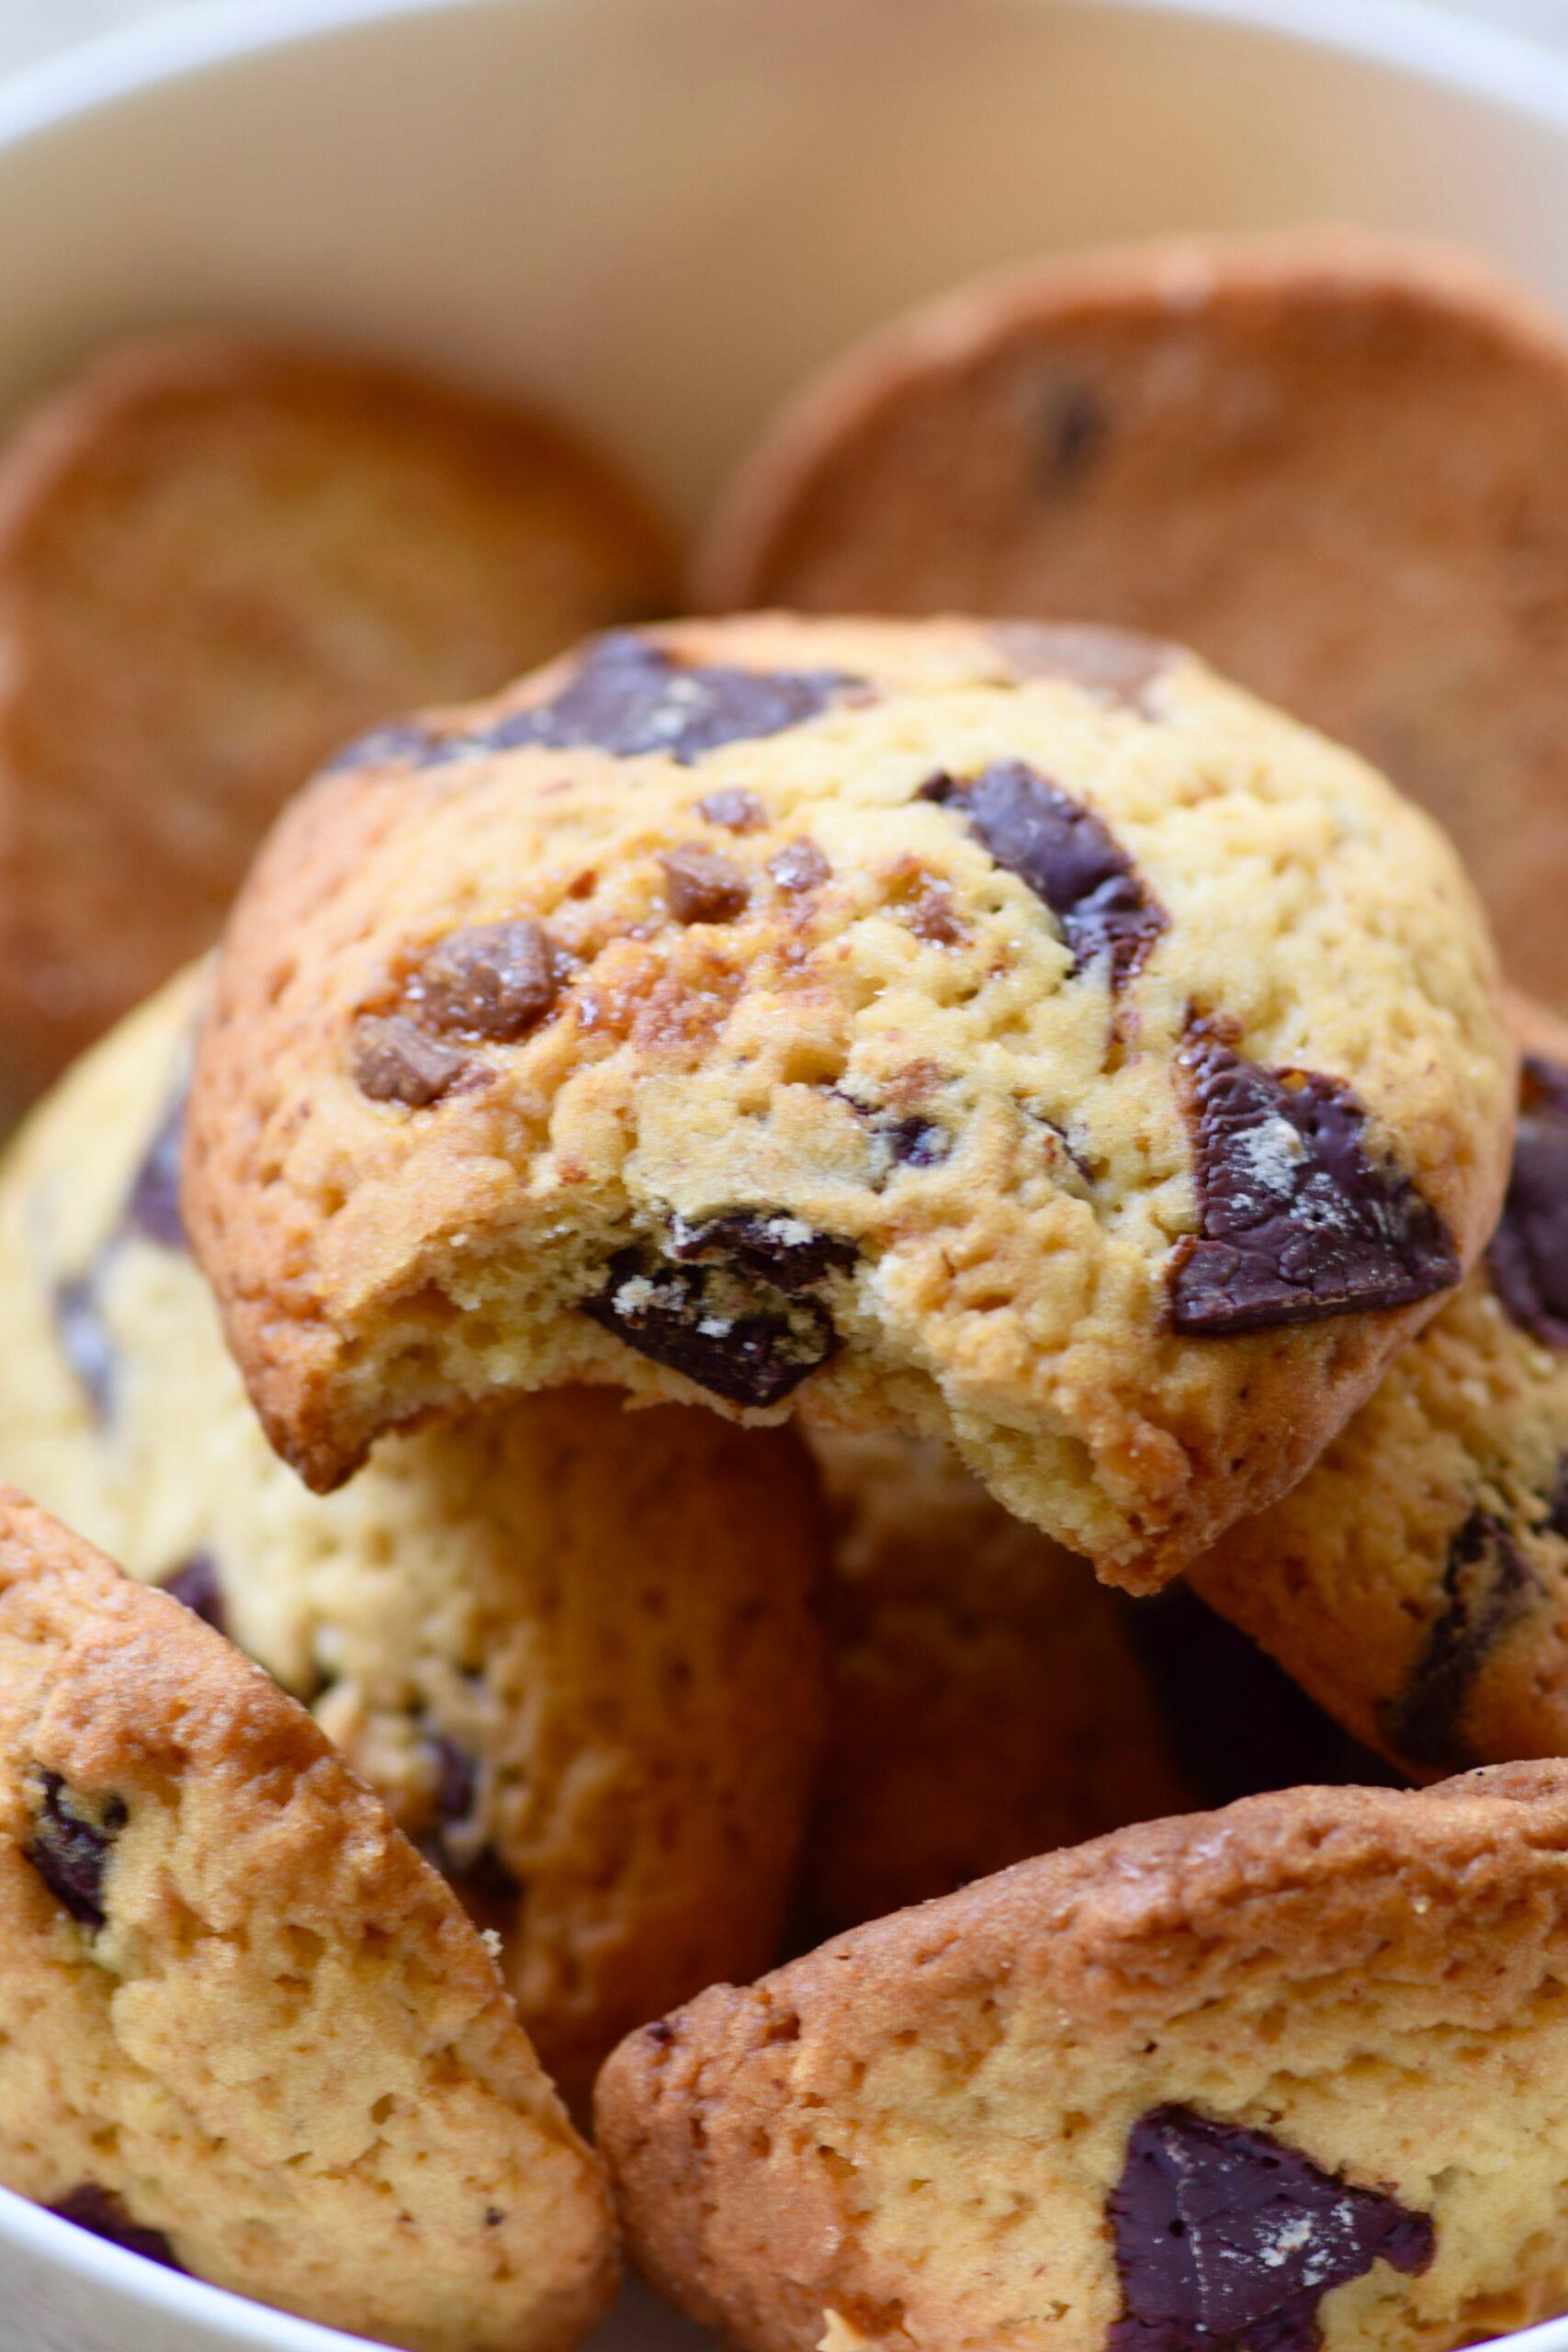 Chocolate chip levain bakery cookies